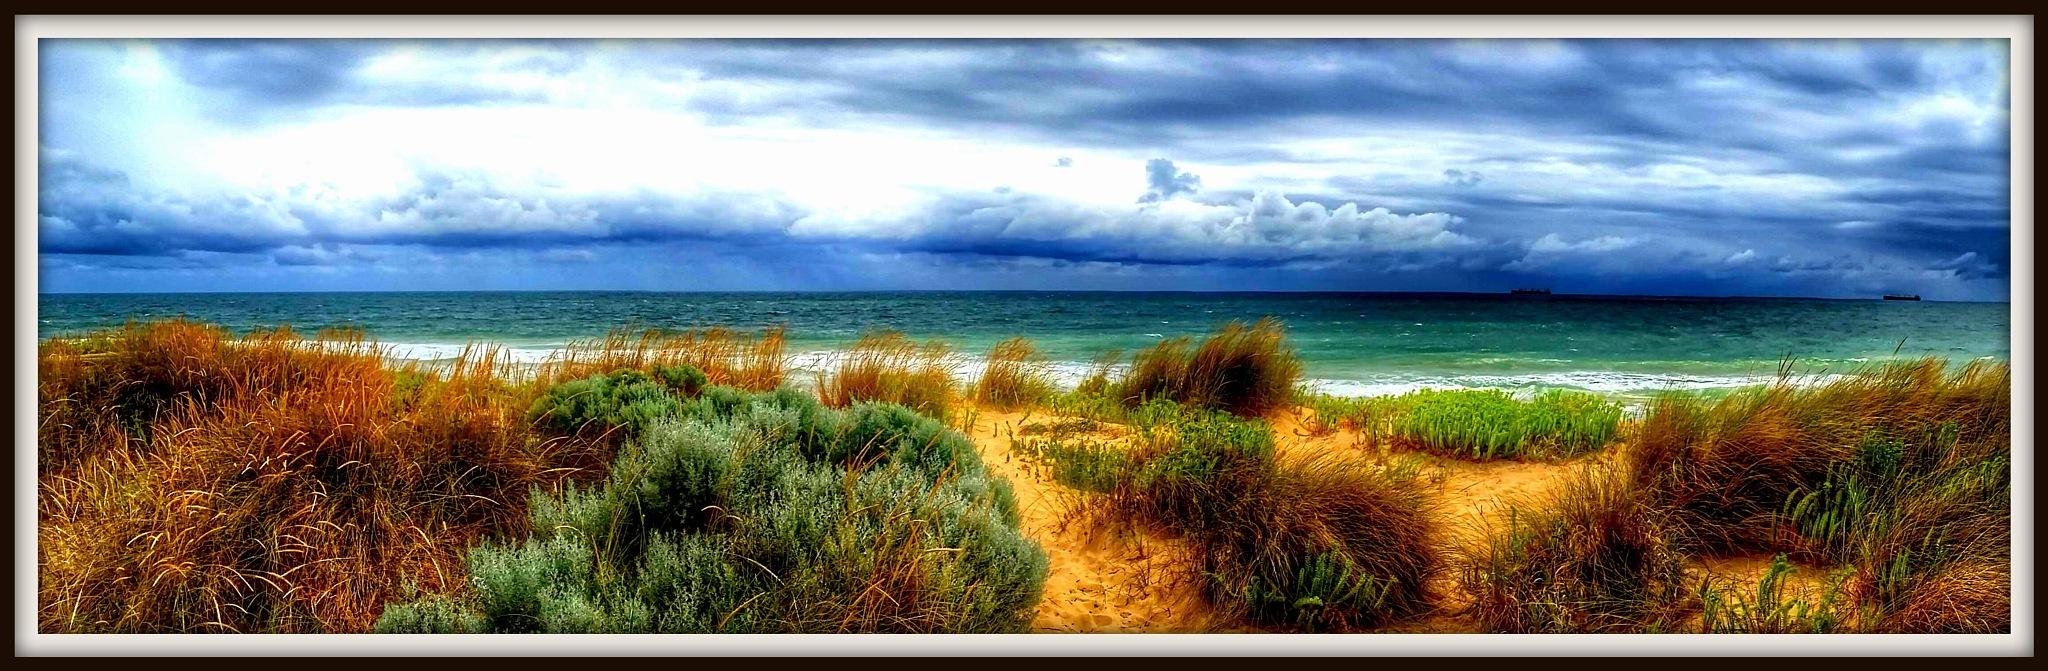 Seascape by Kathleen Audrey Lane